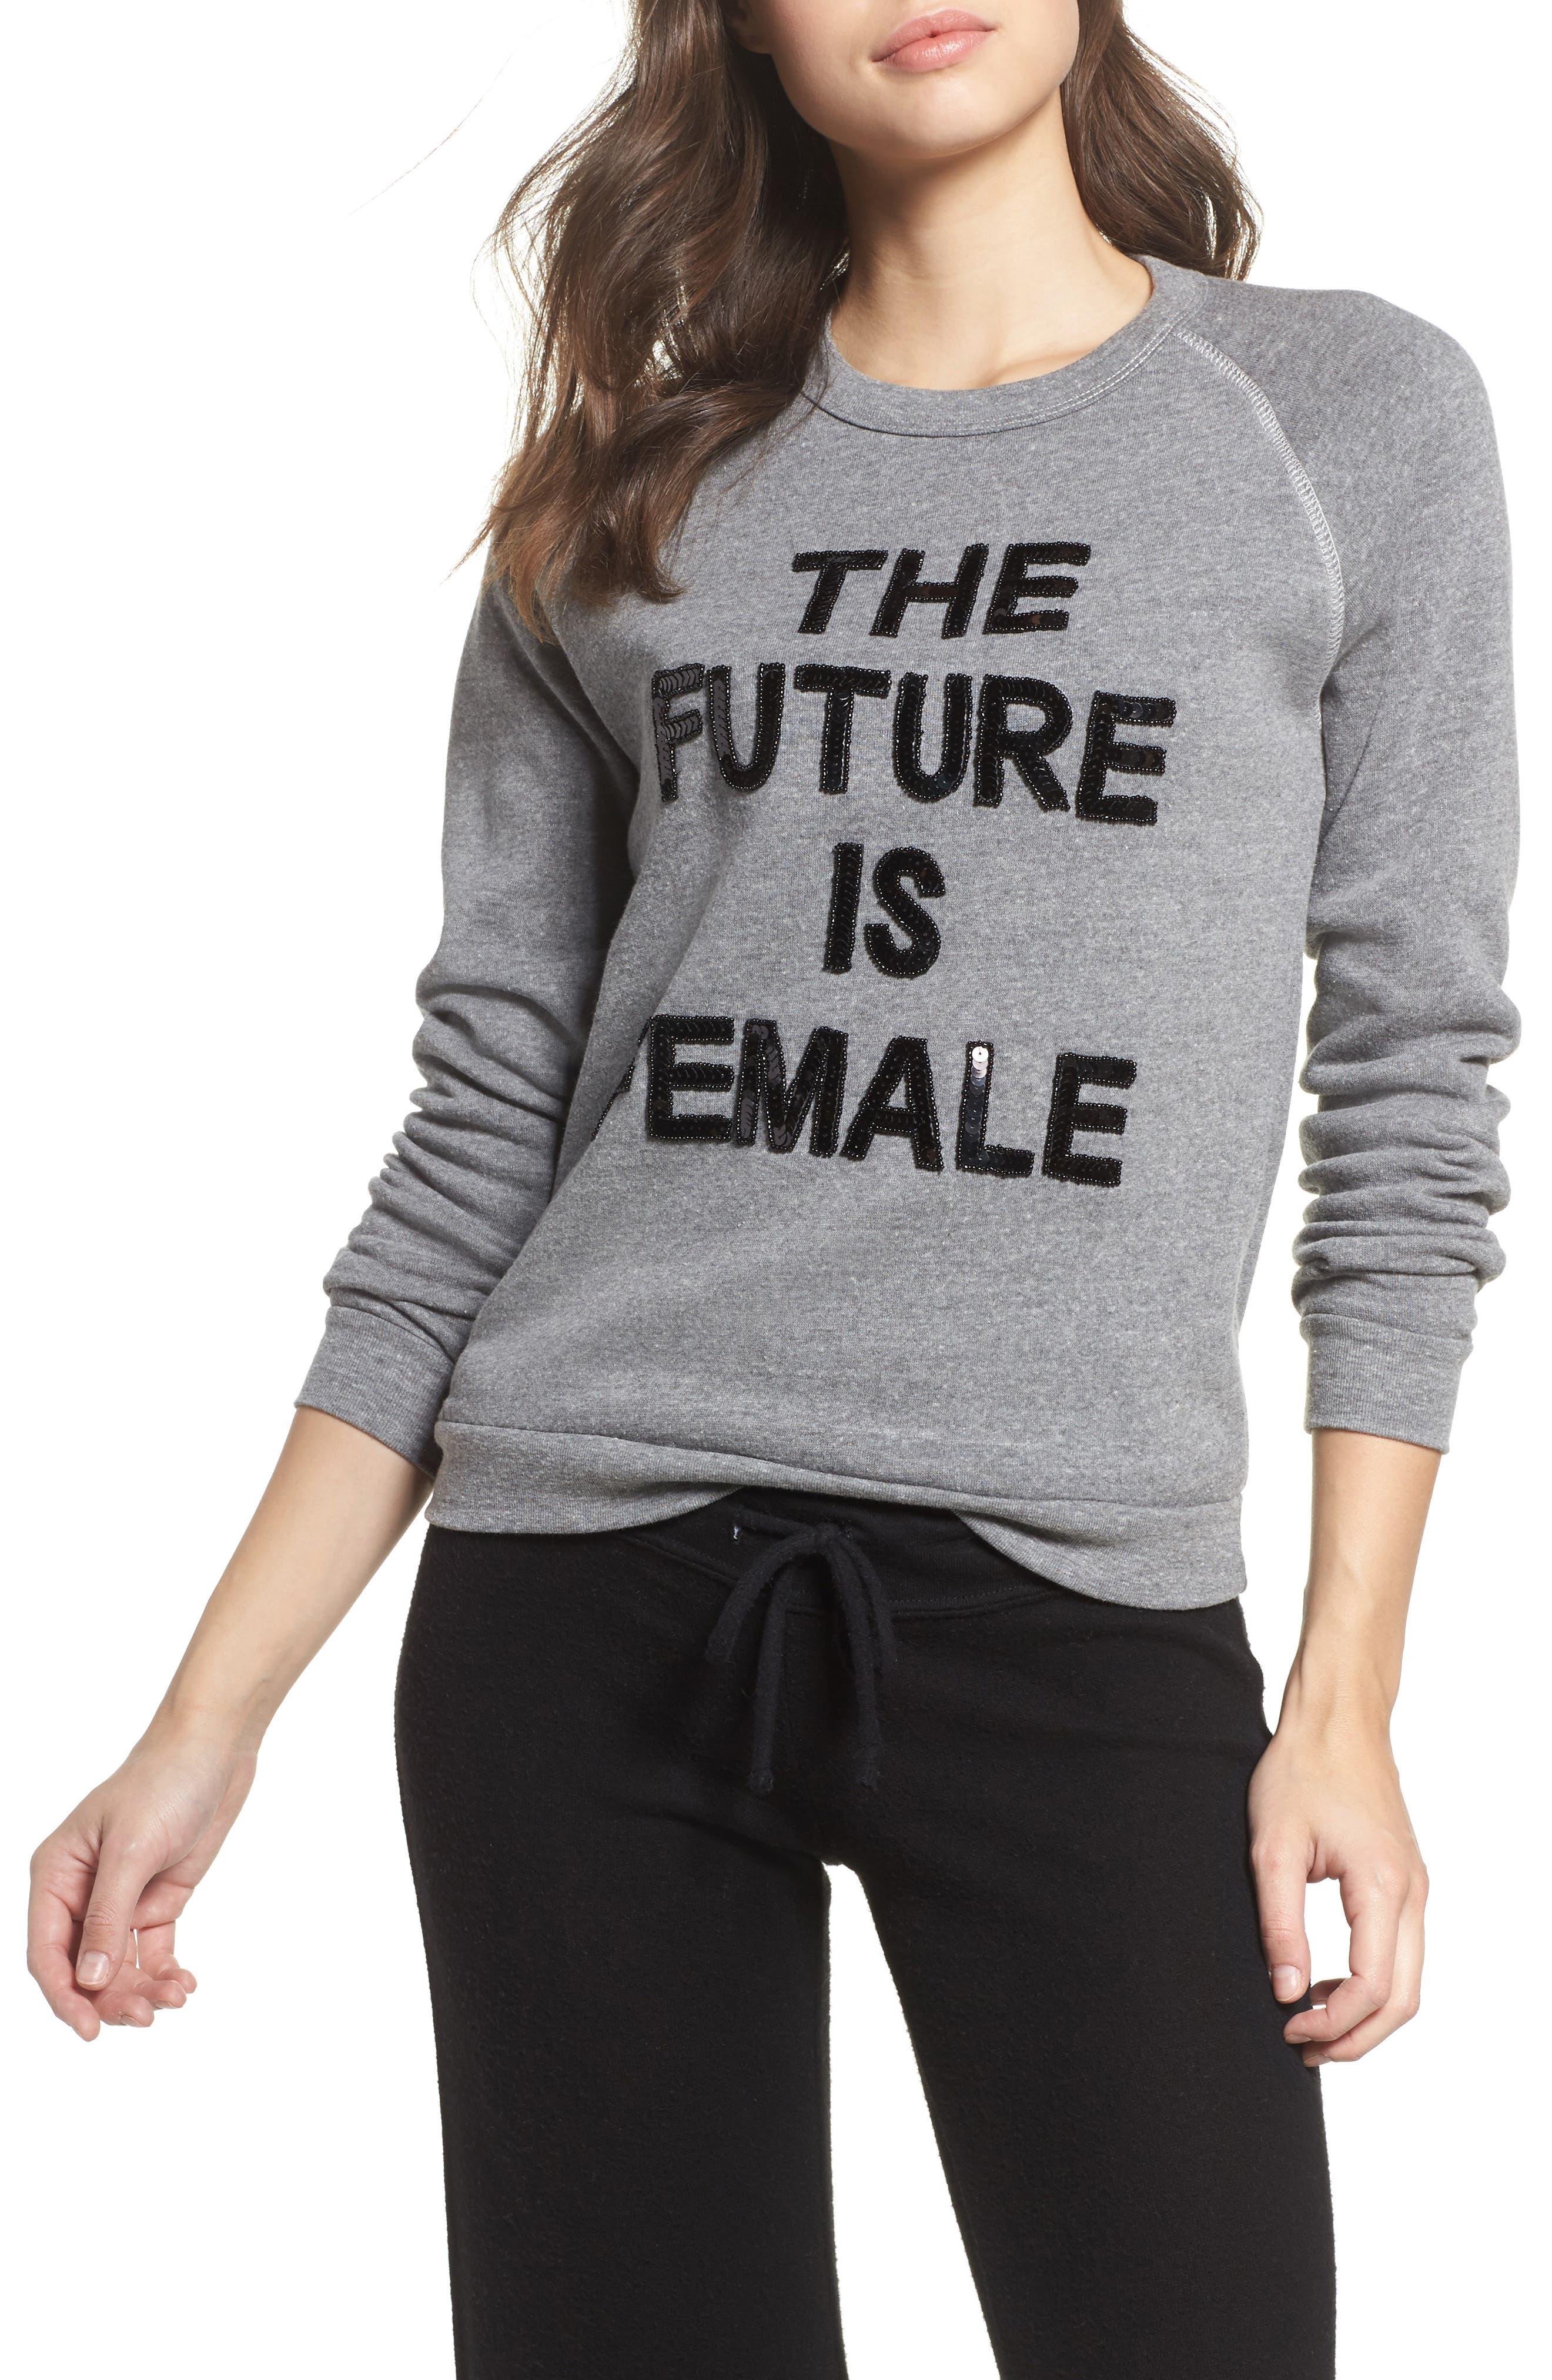 Main Image - Bow & Drape The Future is Female French Terry Sweatshirt